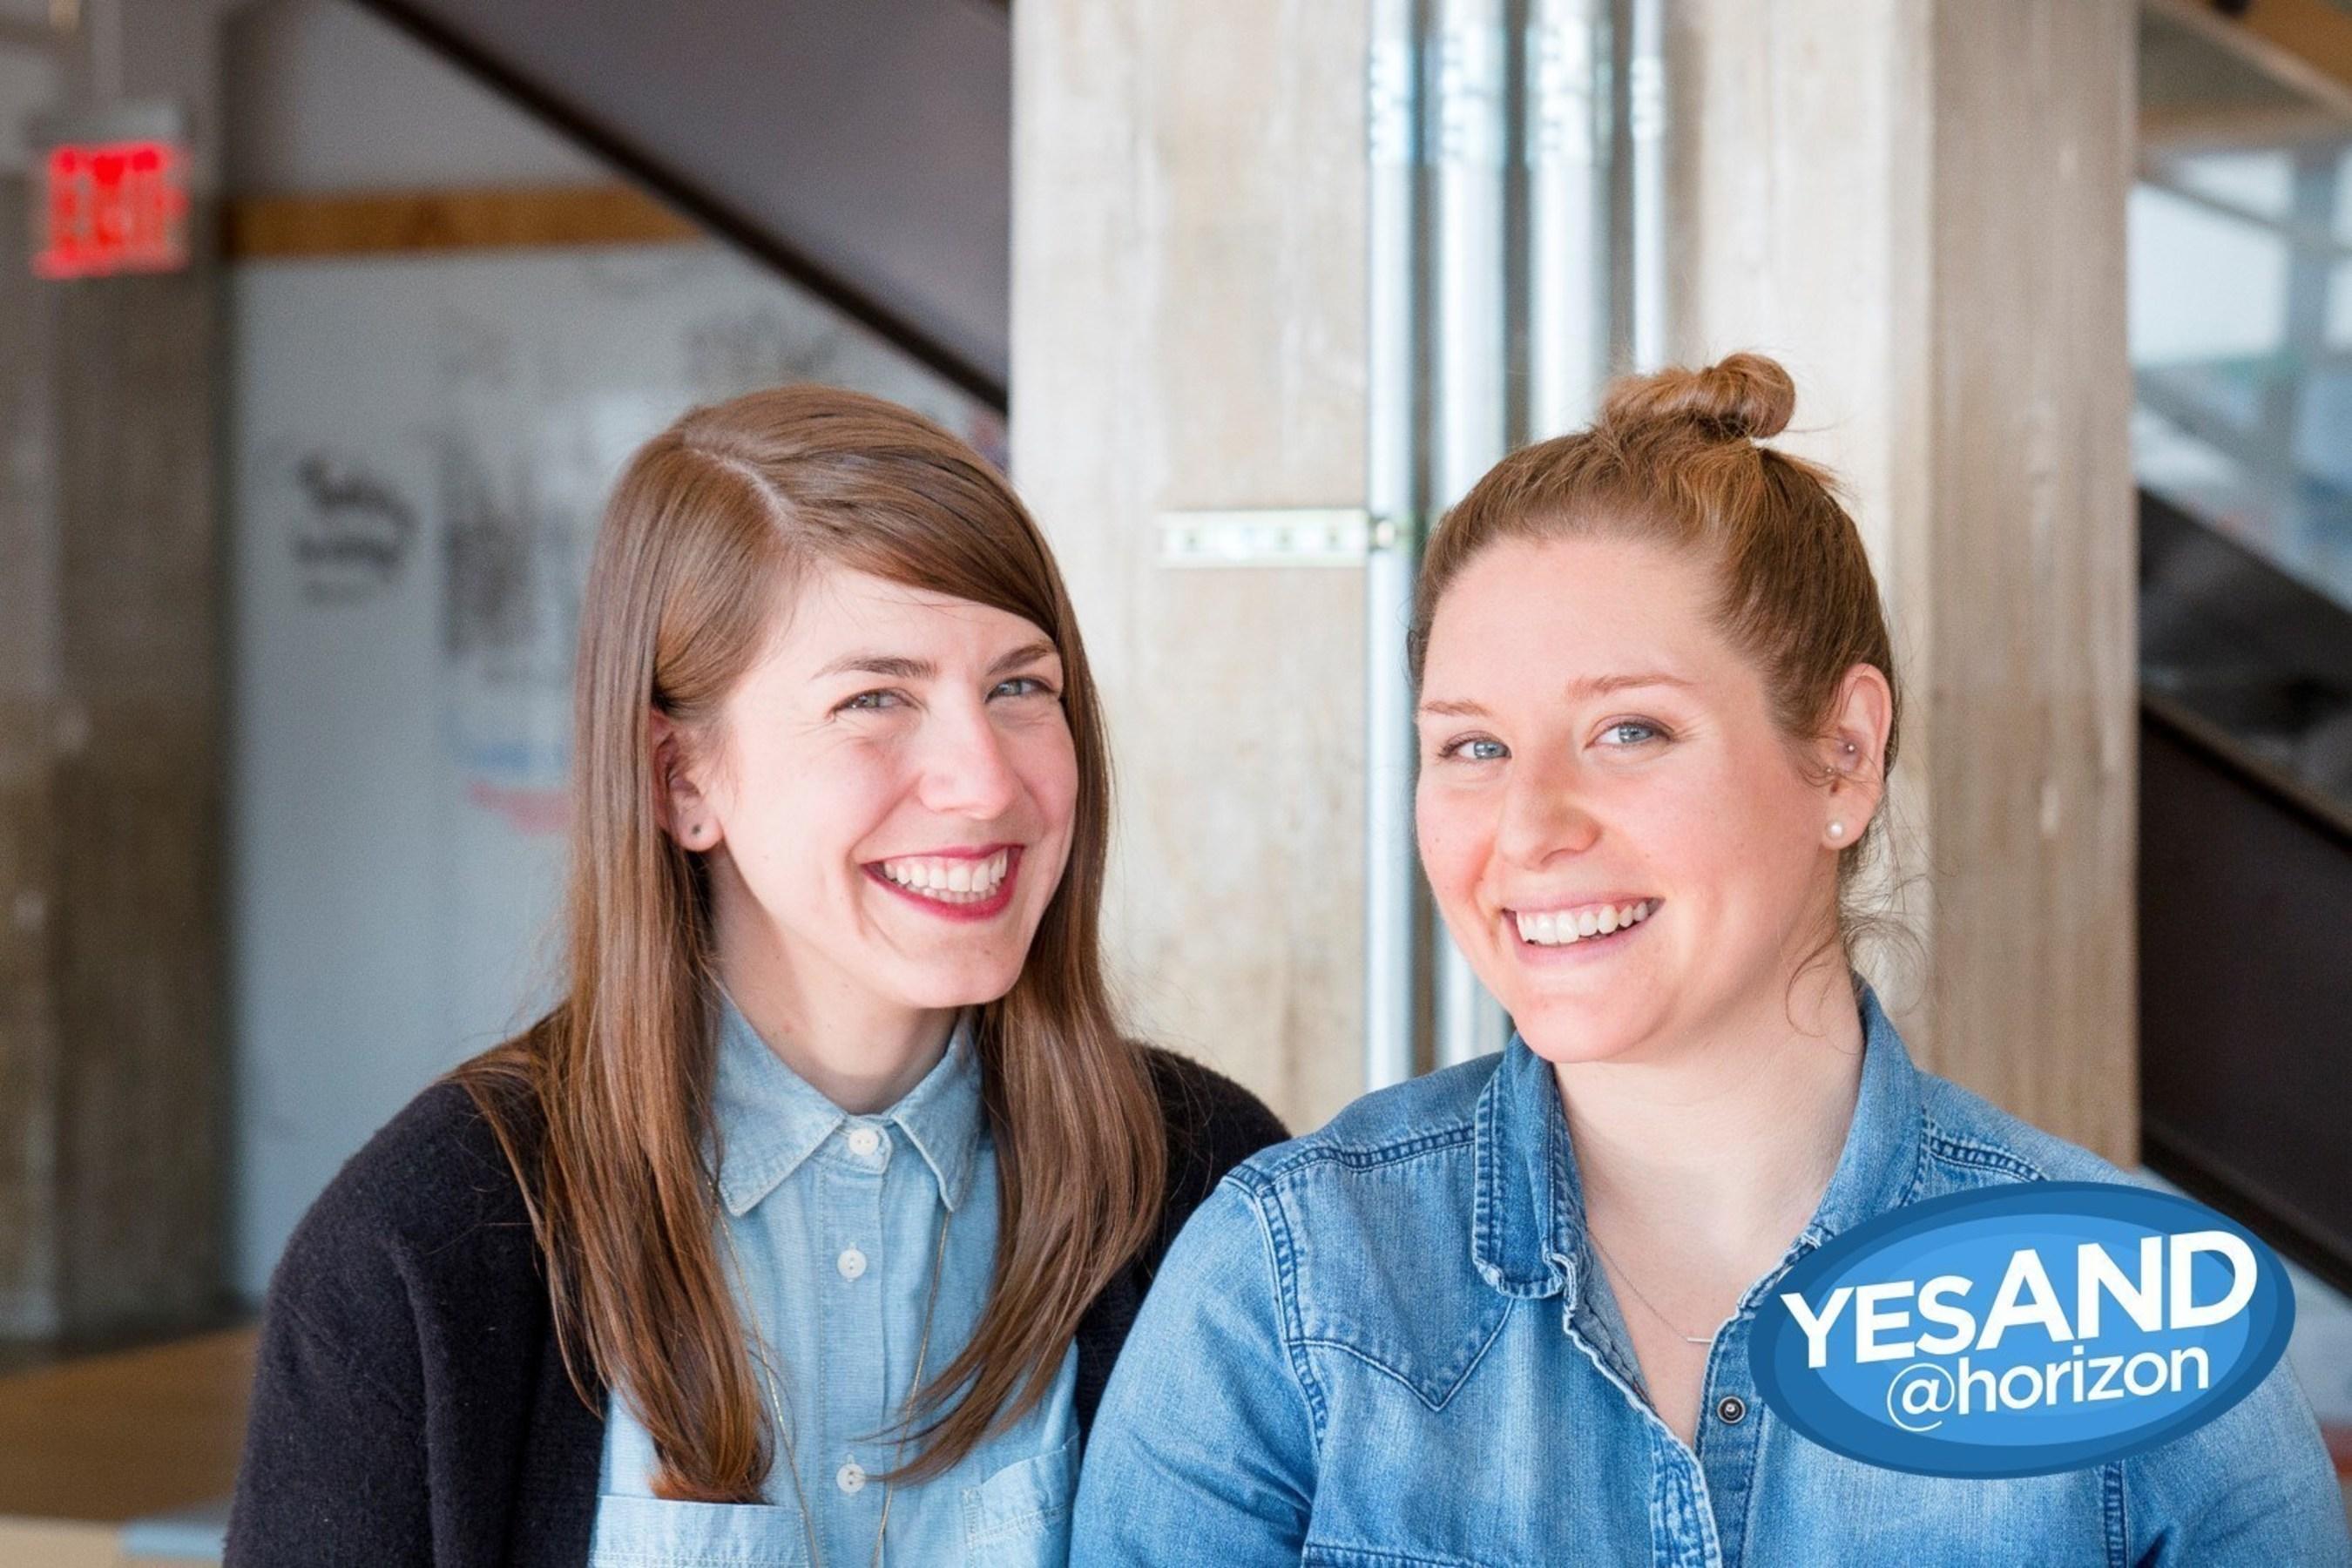 Chelsea Ramsey (left) and Ali Joseph (right), founders of YesAND@Horizon